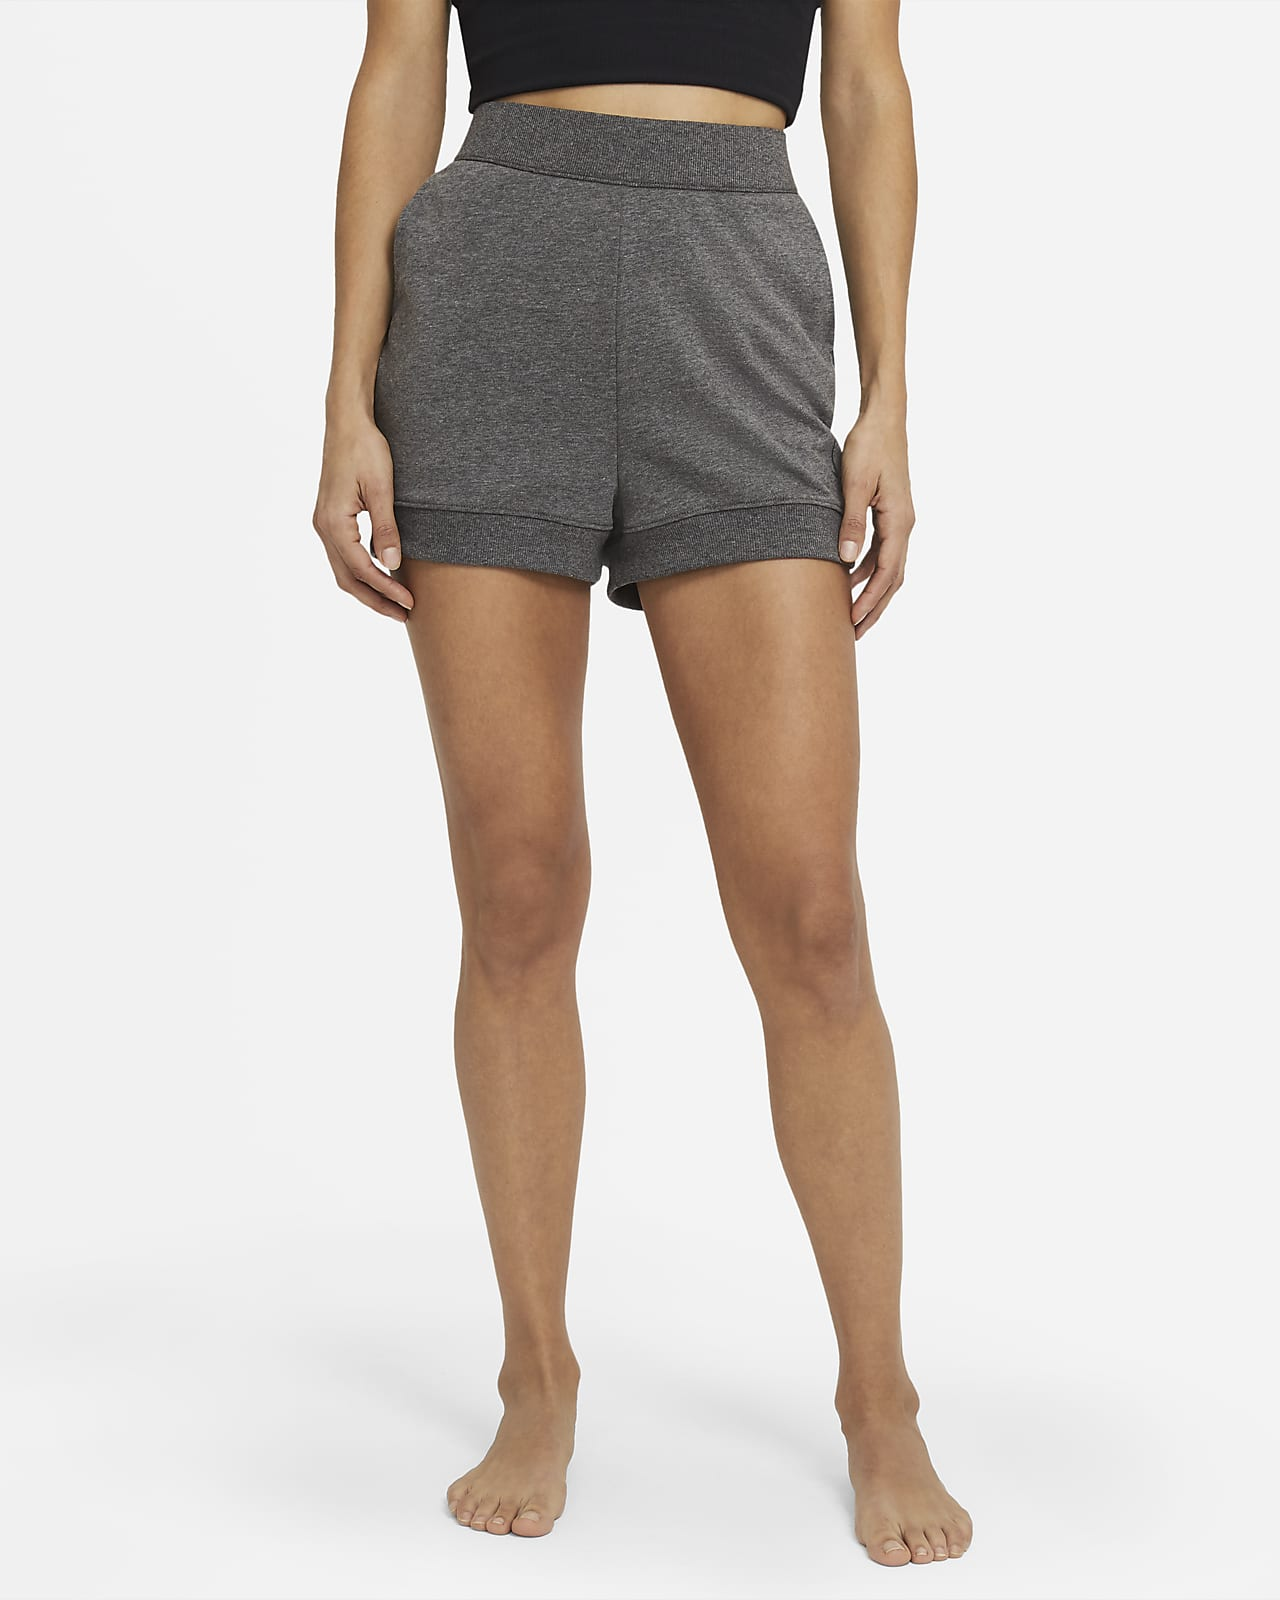 Nike Yoga Women's French Terry Shorts